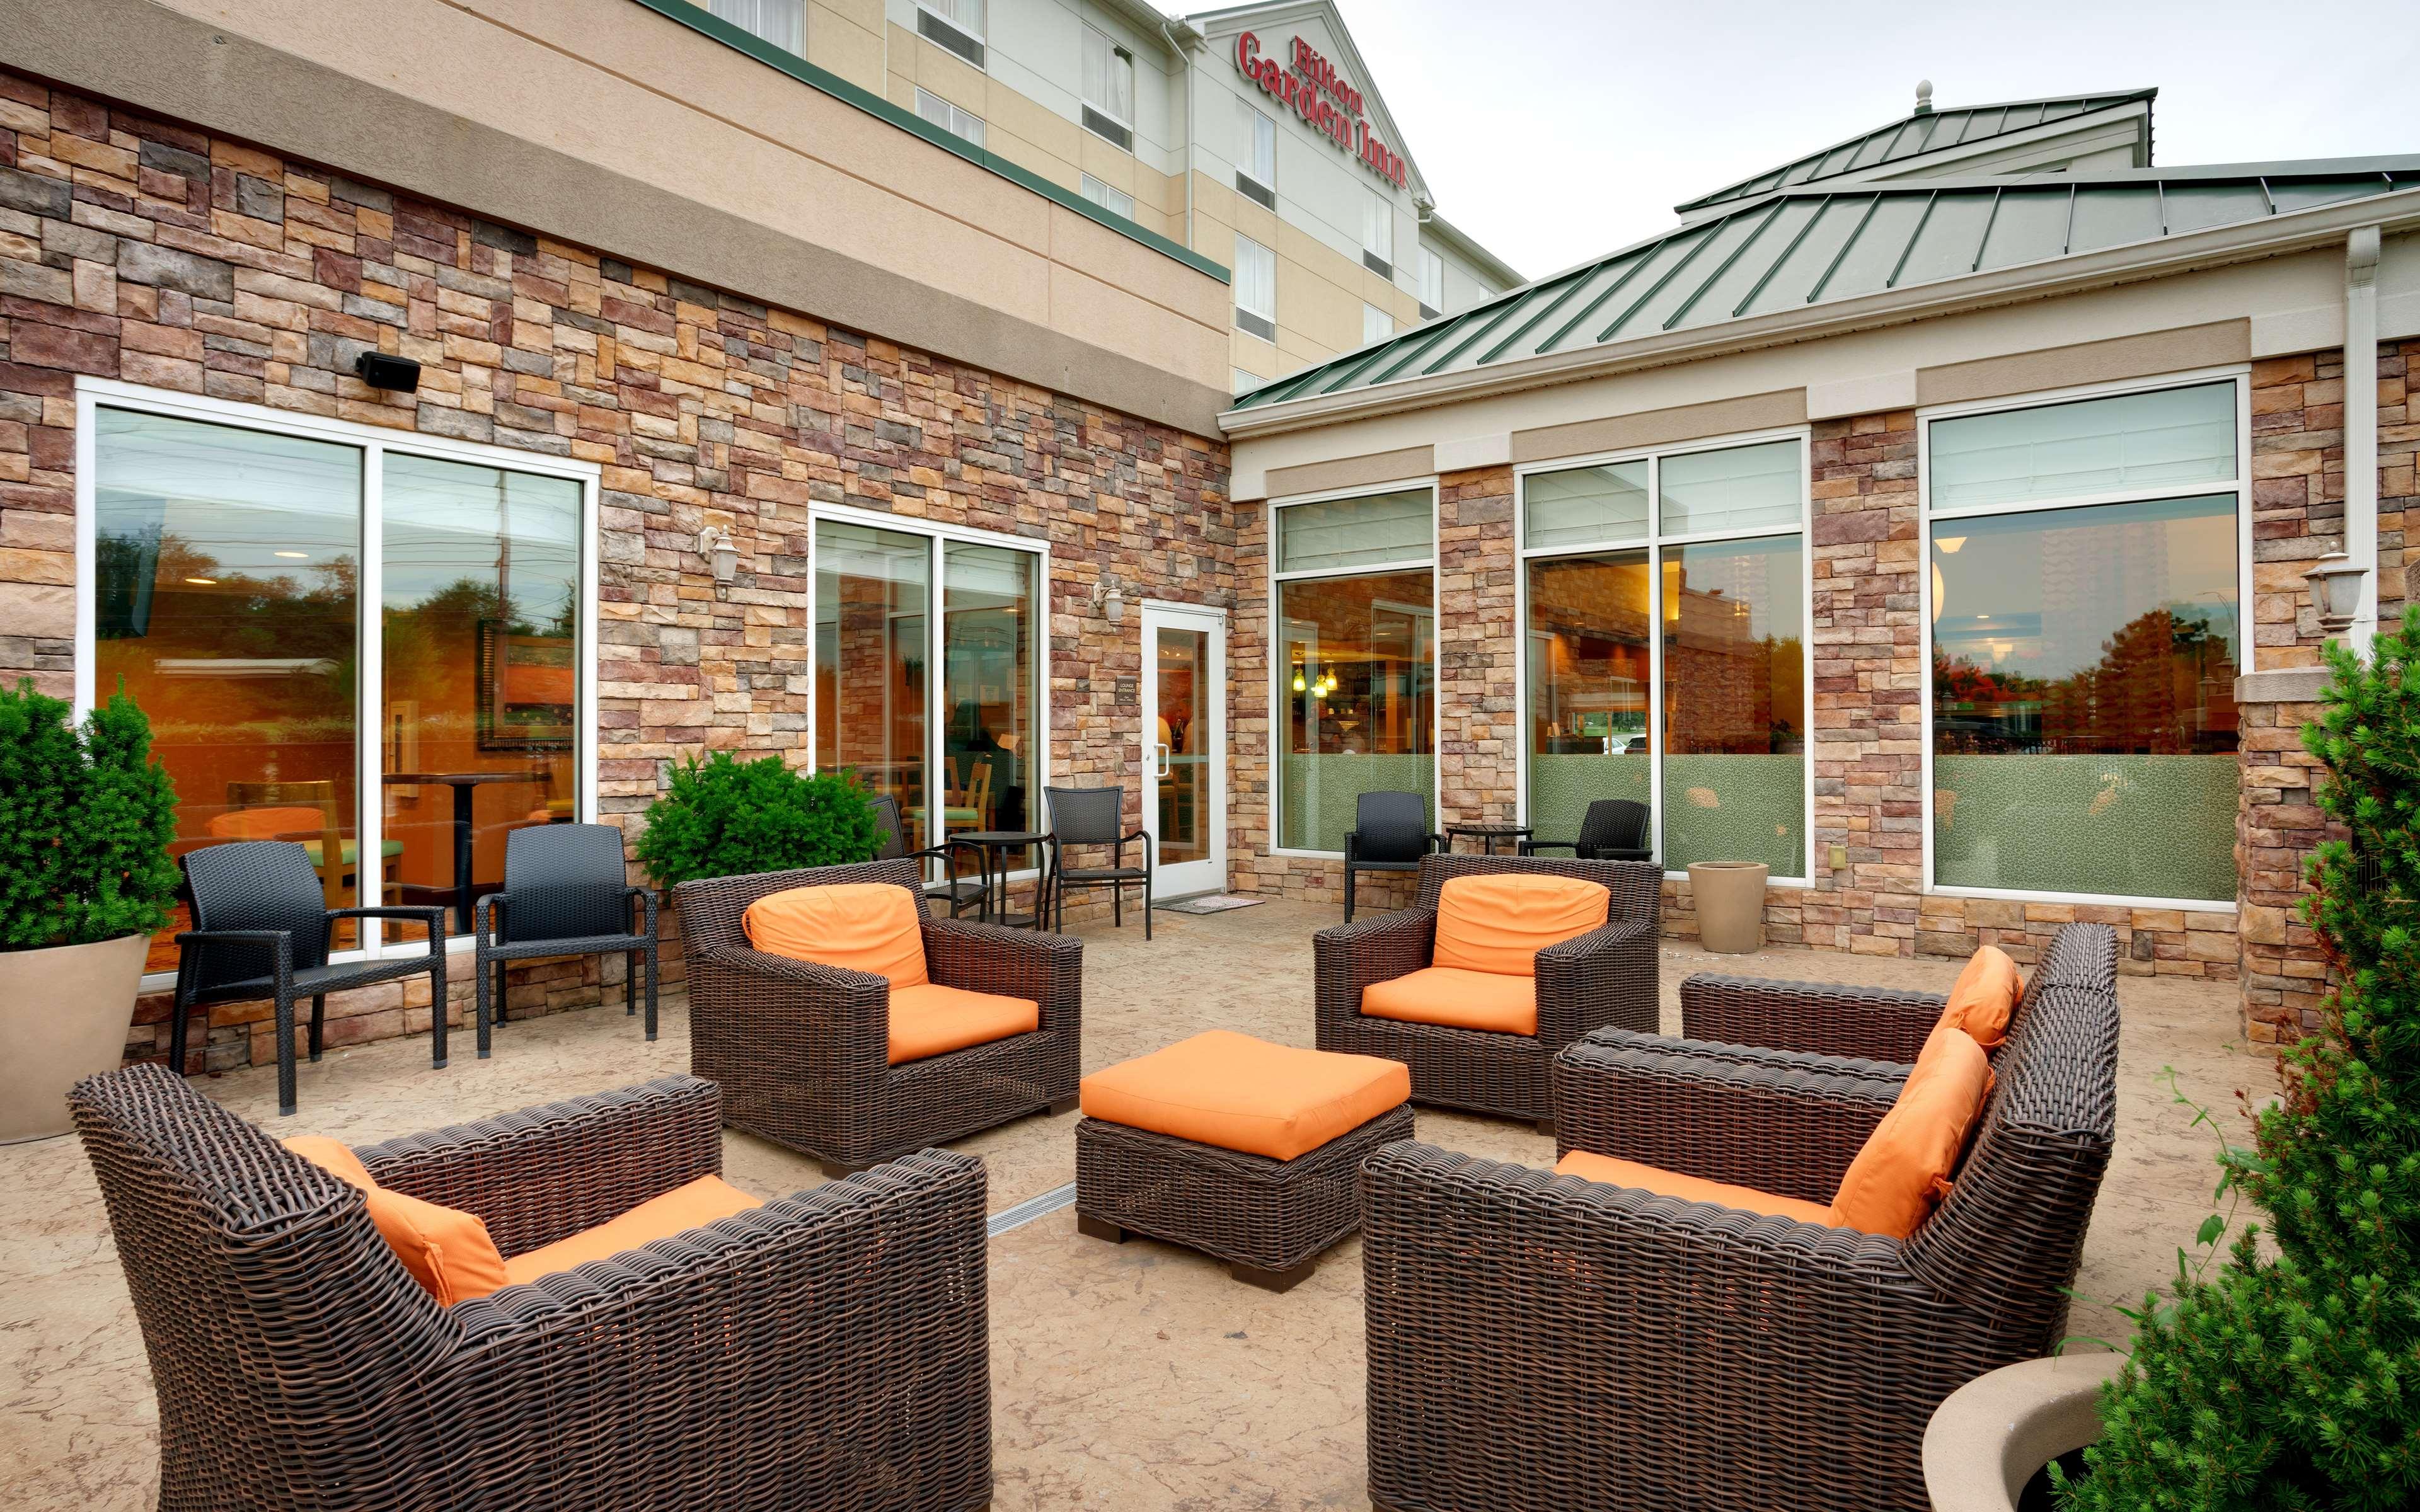 Hilton Garden Inn Clarksville image 1